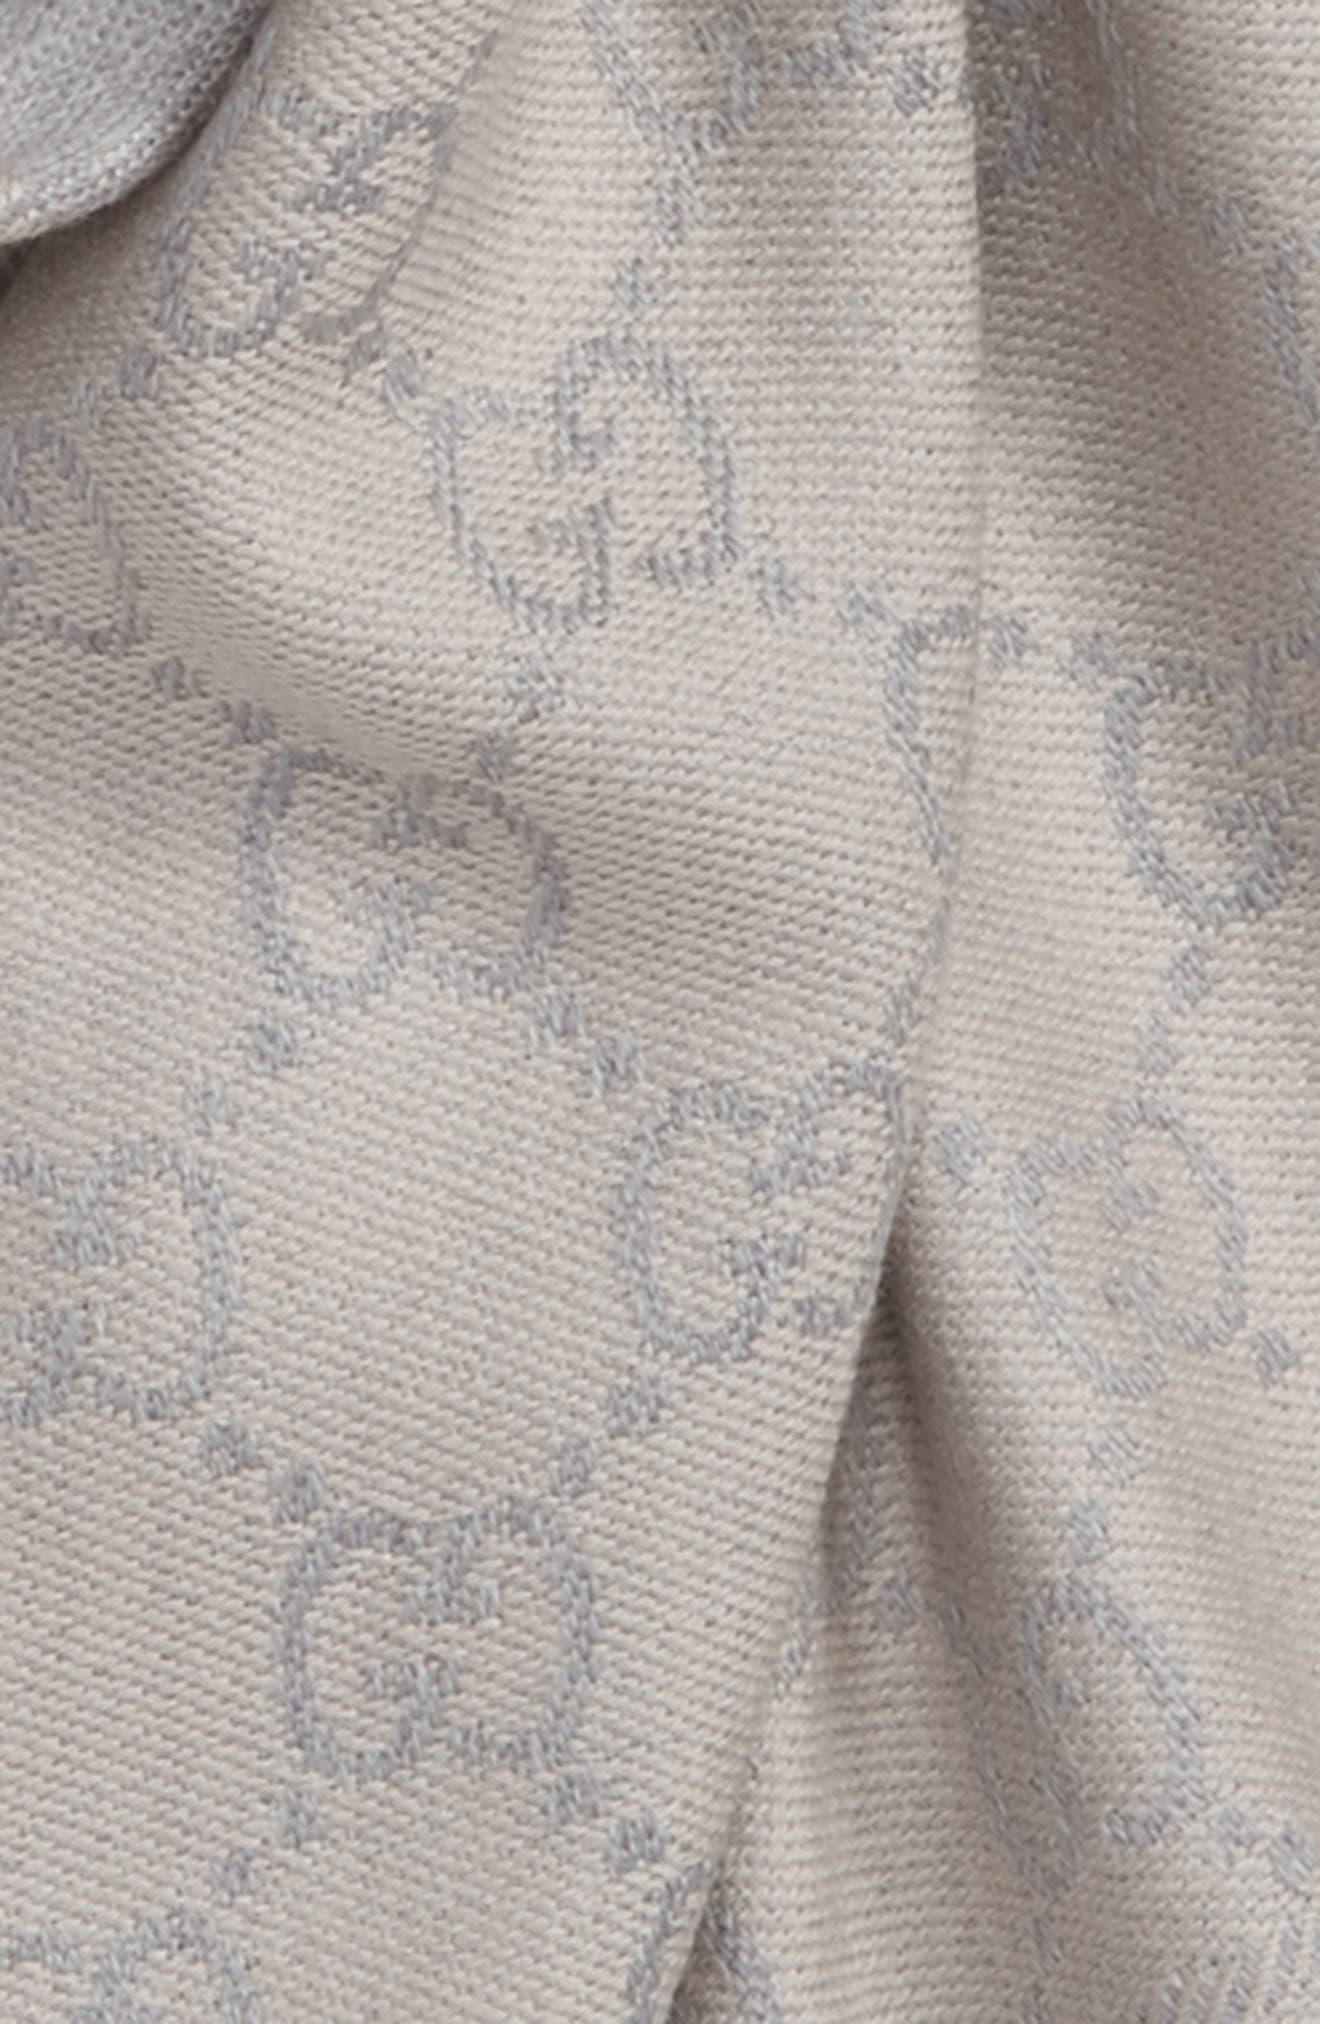 GG Jacquard Wool Scarf,                             Alternate thumbnail 3, color,                             1763 Zinc/Ight Grey